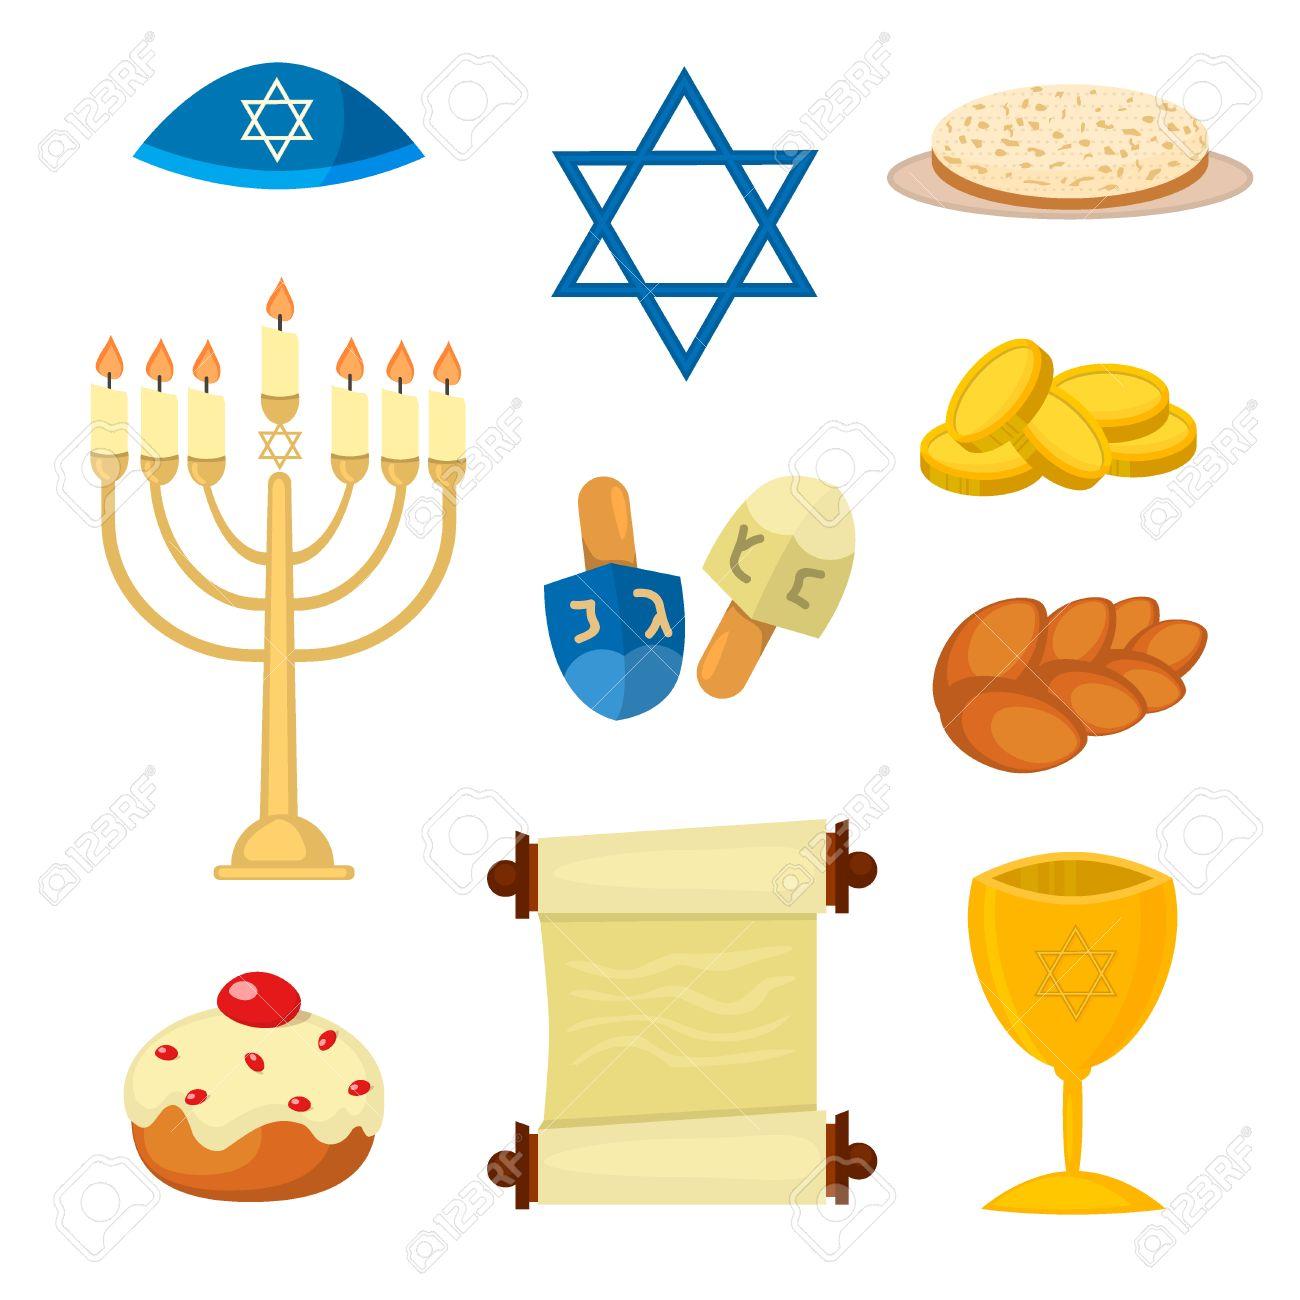 Uncategorized Chanukah Symbols judaism church traditional symbols jewish hanukkah set various and items celebration flat